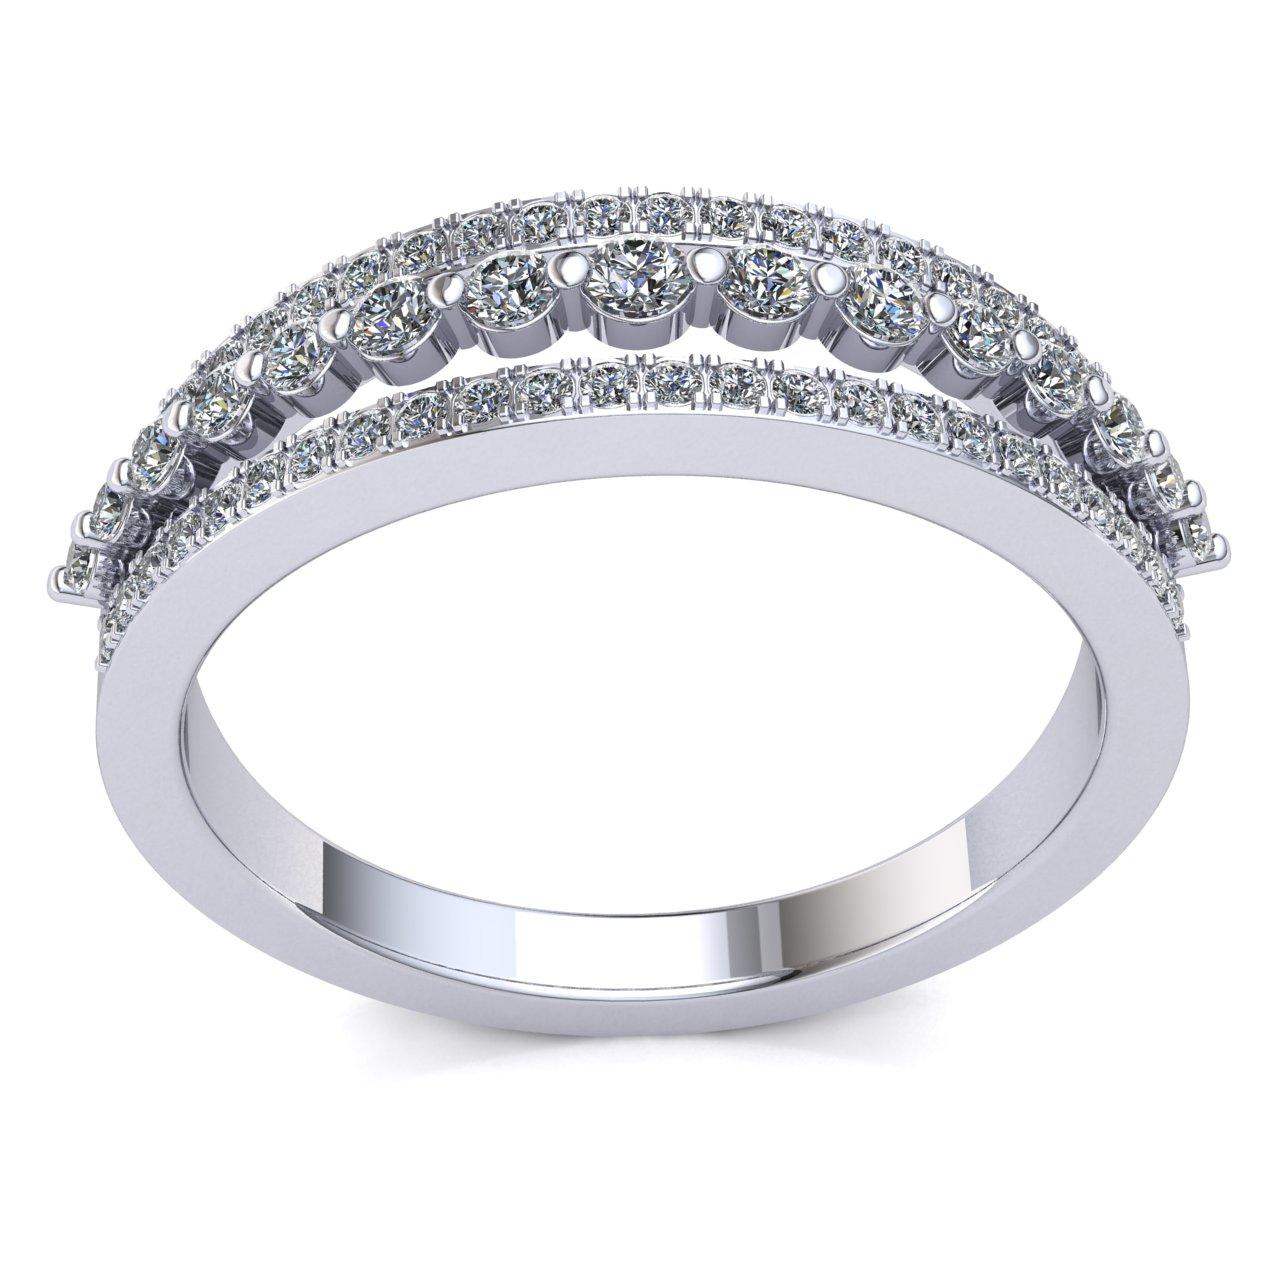 Genuine-0-5ctw-Round-Cut-Diamond-Ladies-Accent-Anniversary-Wedding-Band-10K-Gold thumbnail 11